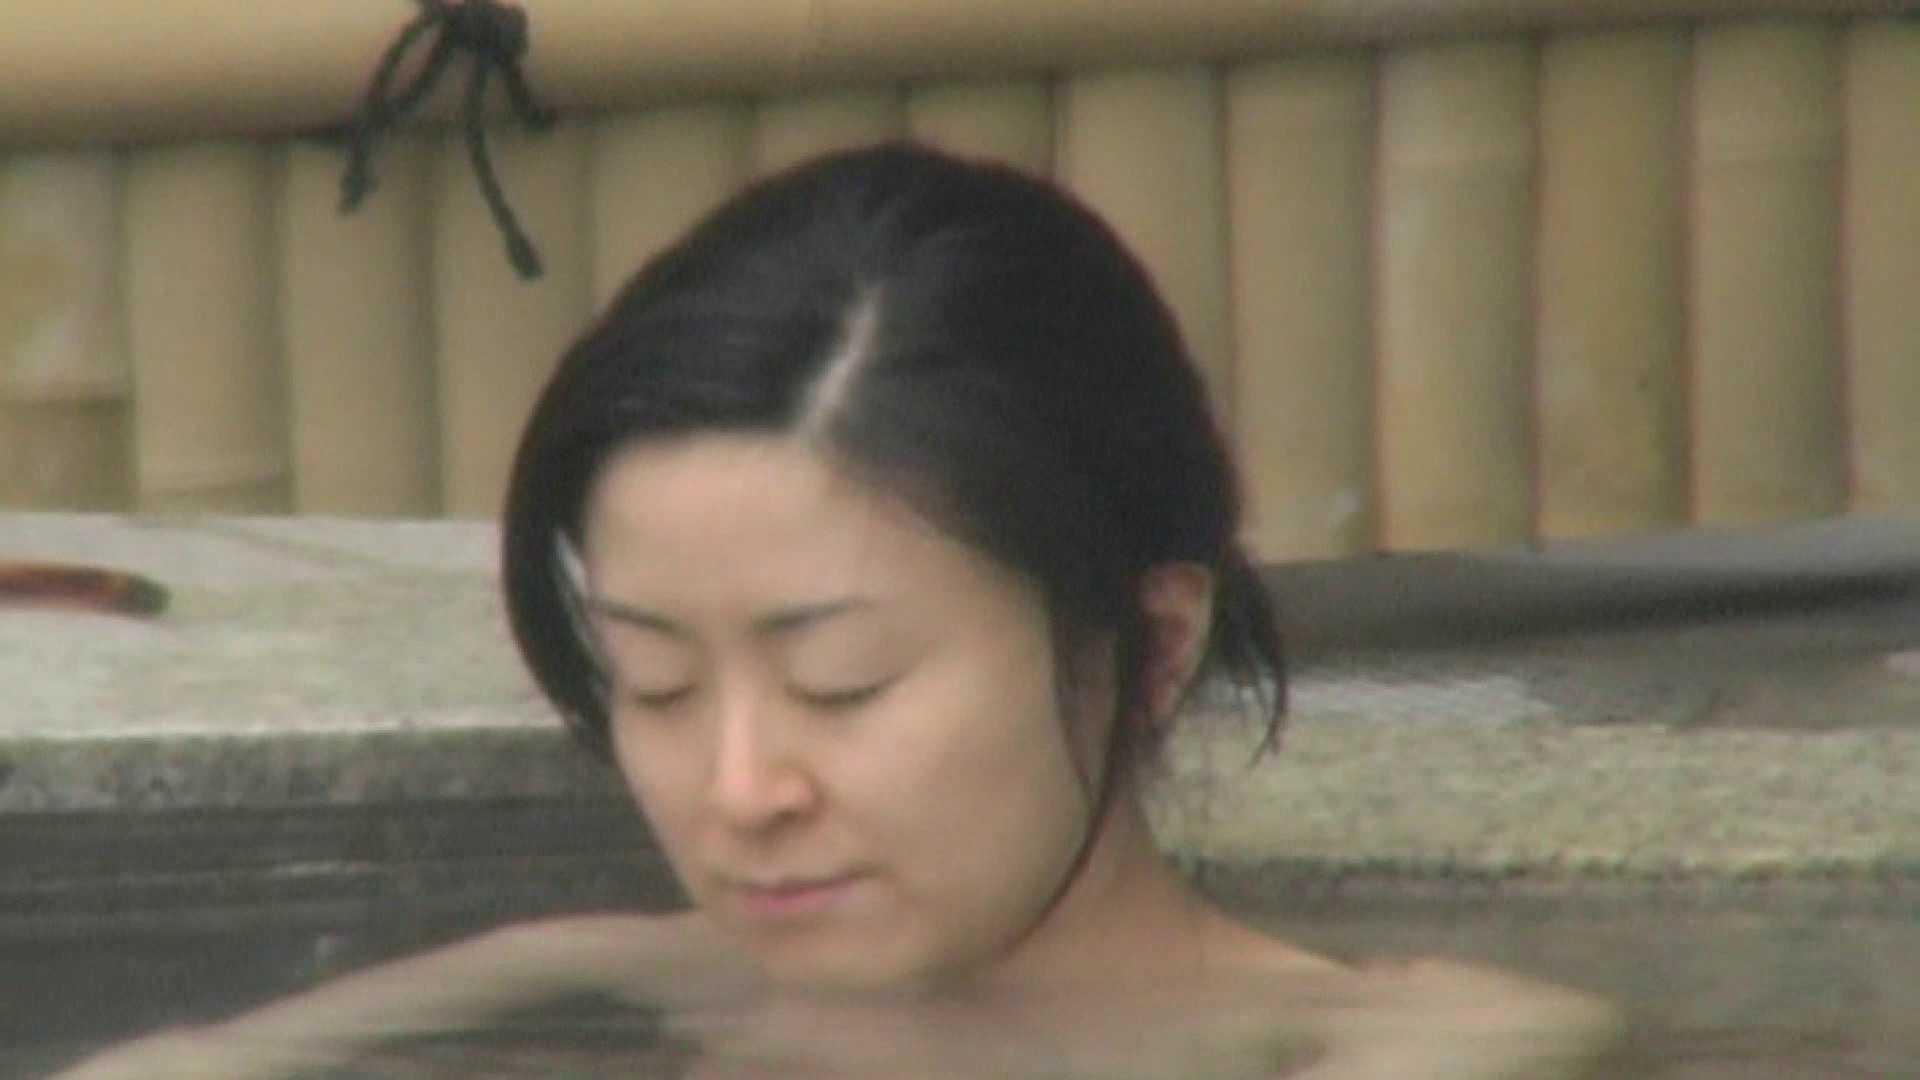 Aquaな露天風呂Vol.548 盗撮  97連発 36